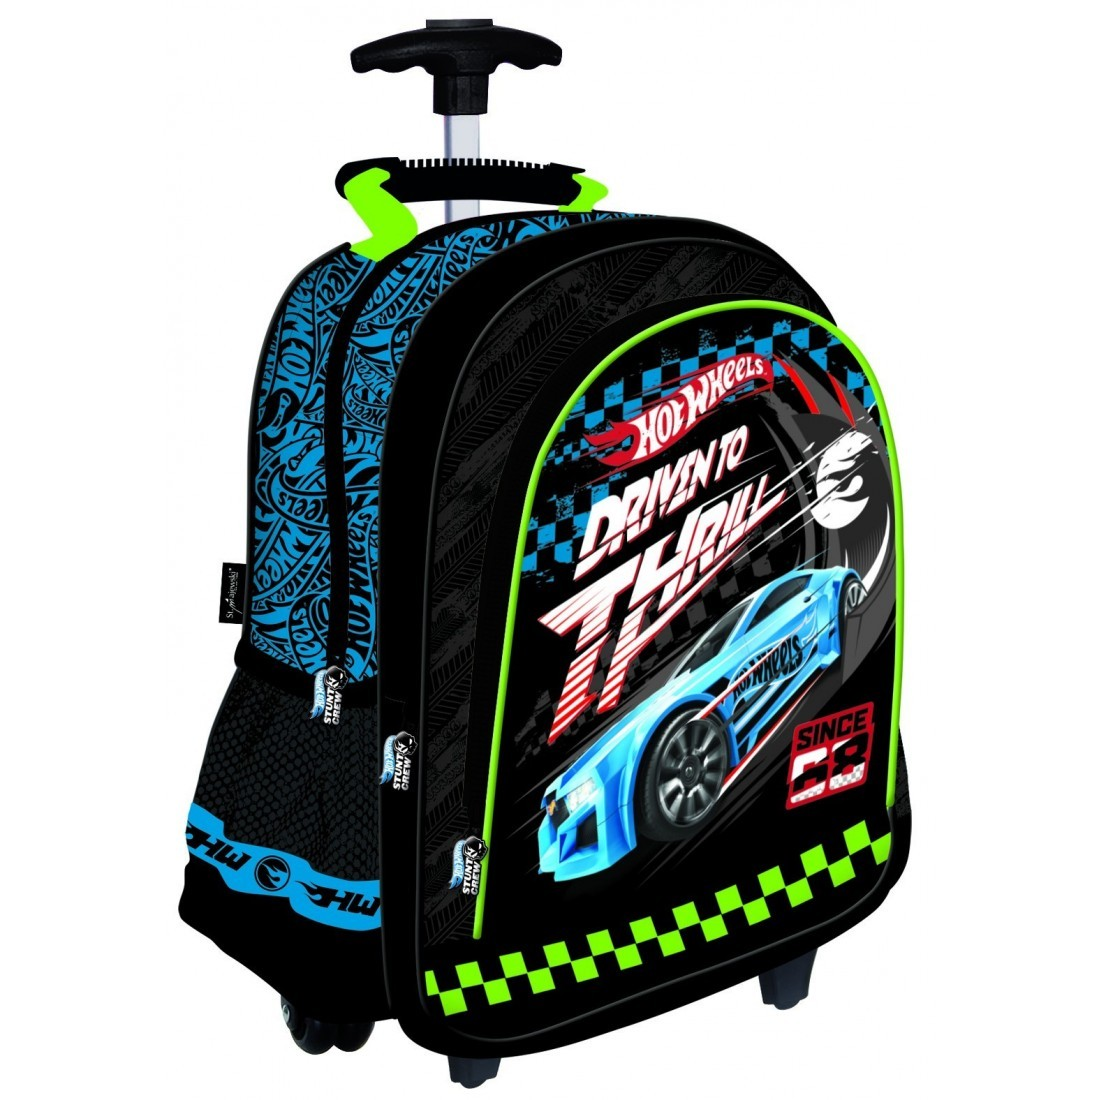 20d26ab29ac9f Plecak szkolny na kółkach Hot Wheels samochody dla chłopaka - plecak ...